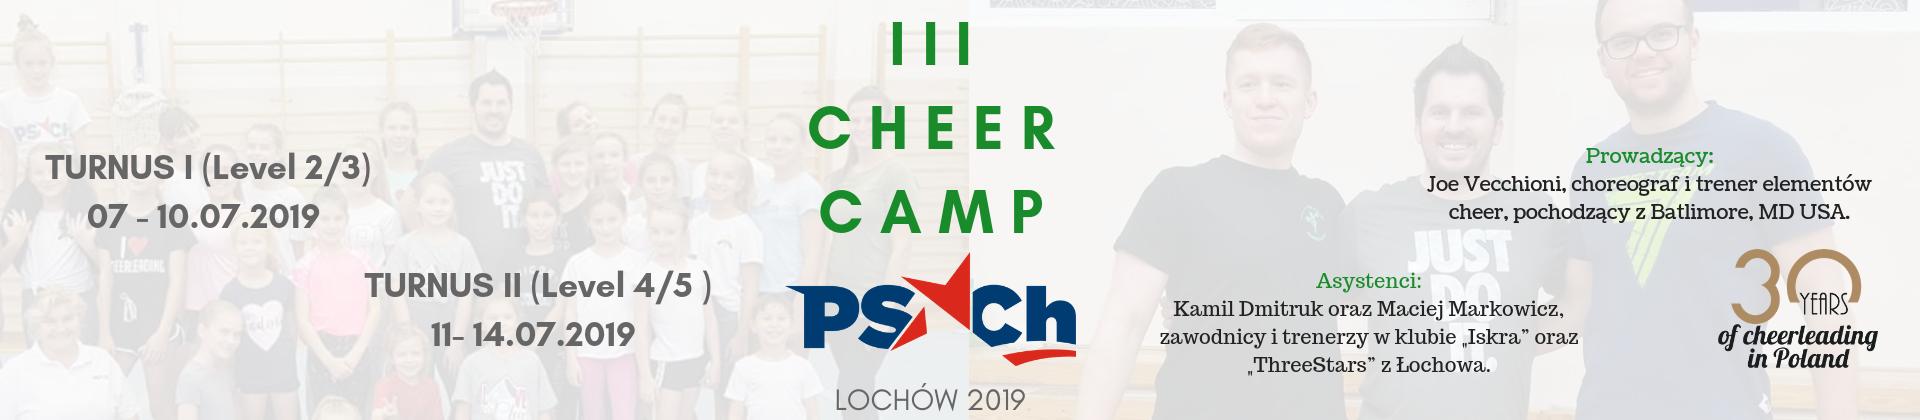 Grand Prix Polski Cheerleaders 2018 (2)